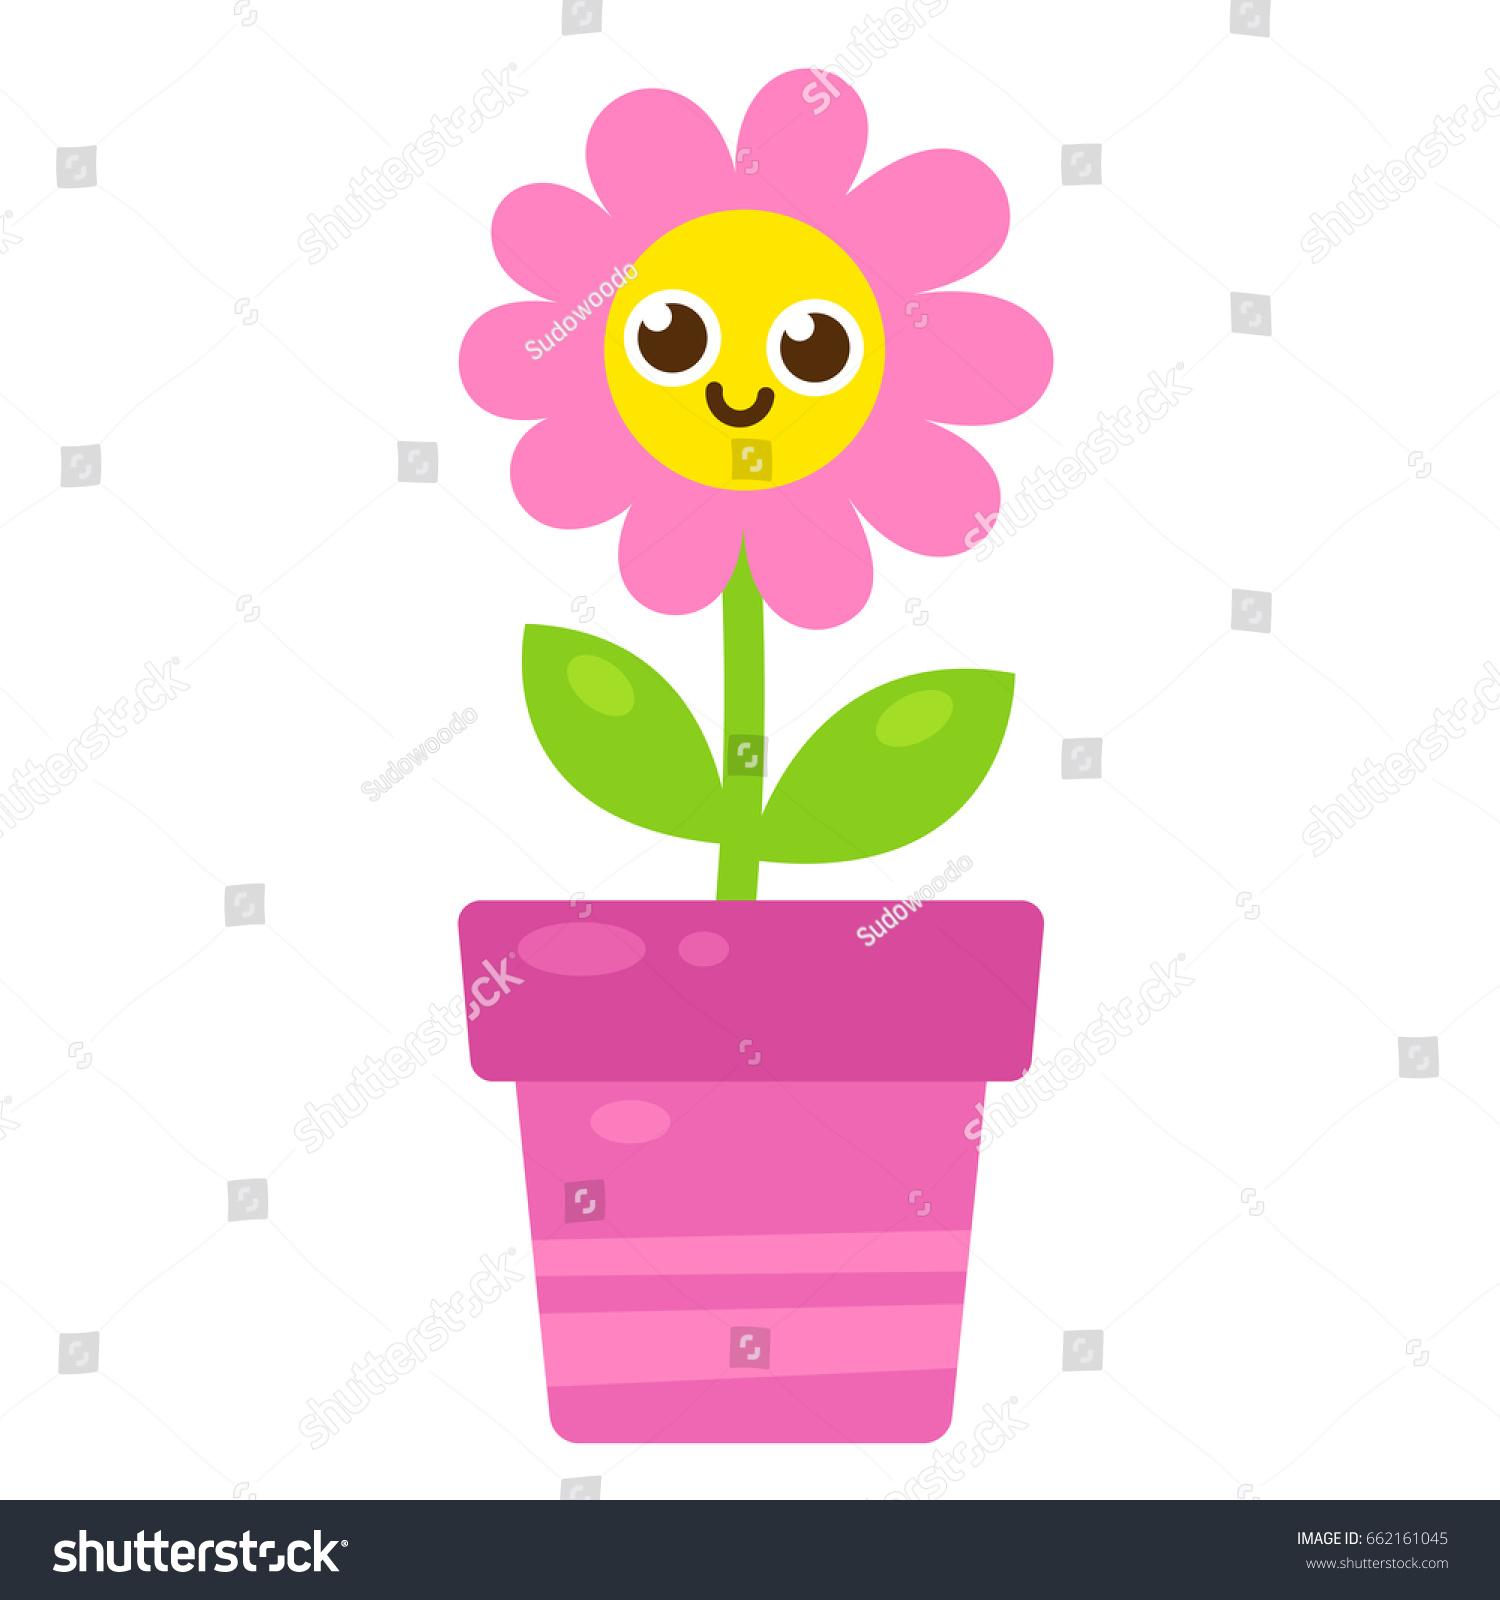 Cute Cartoon Pink Flower Smiling Face Stock Illustration 662161045